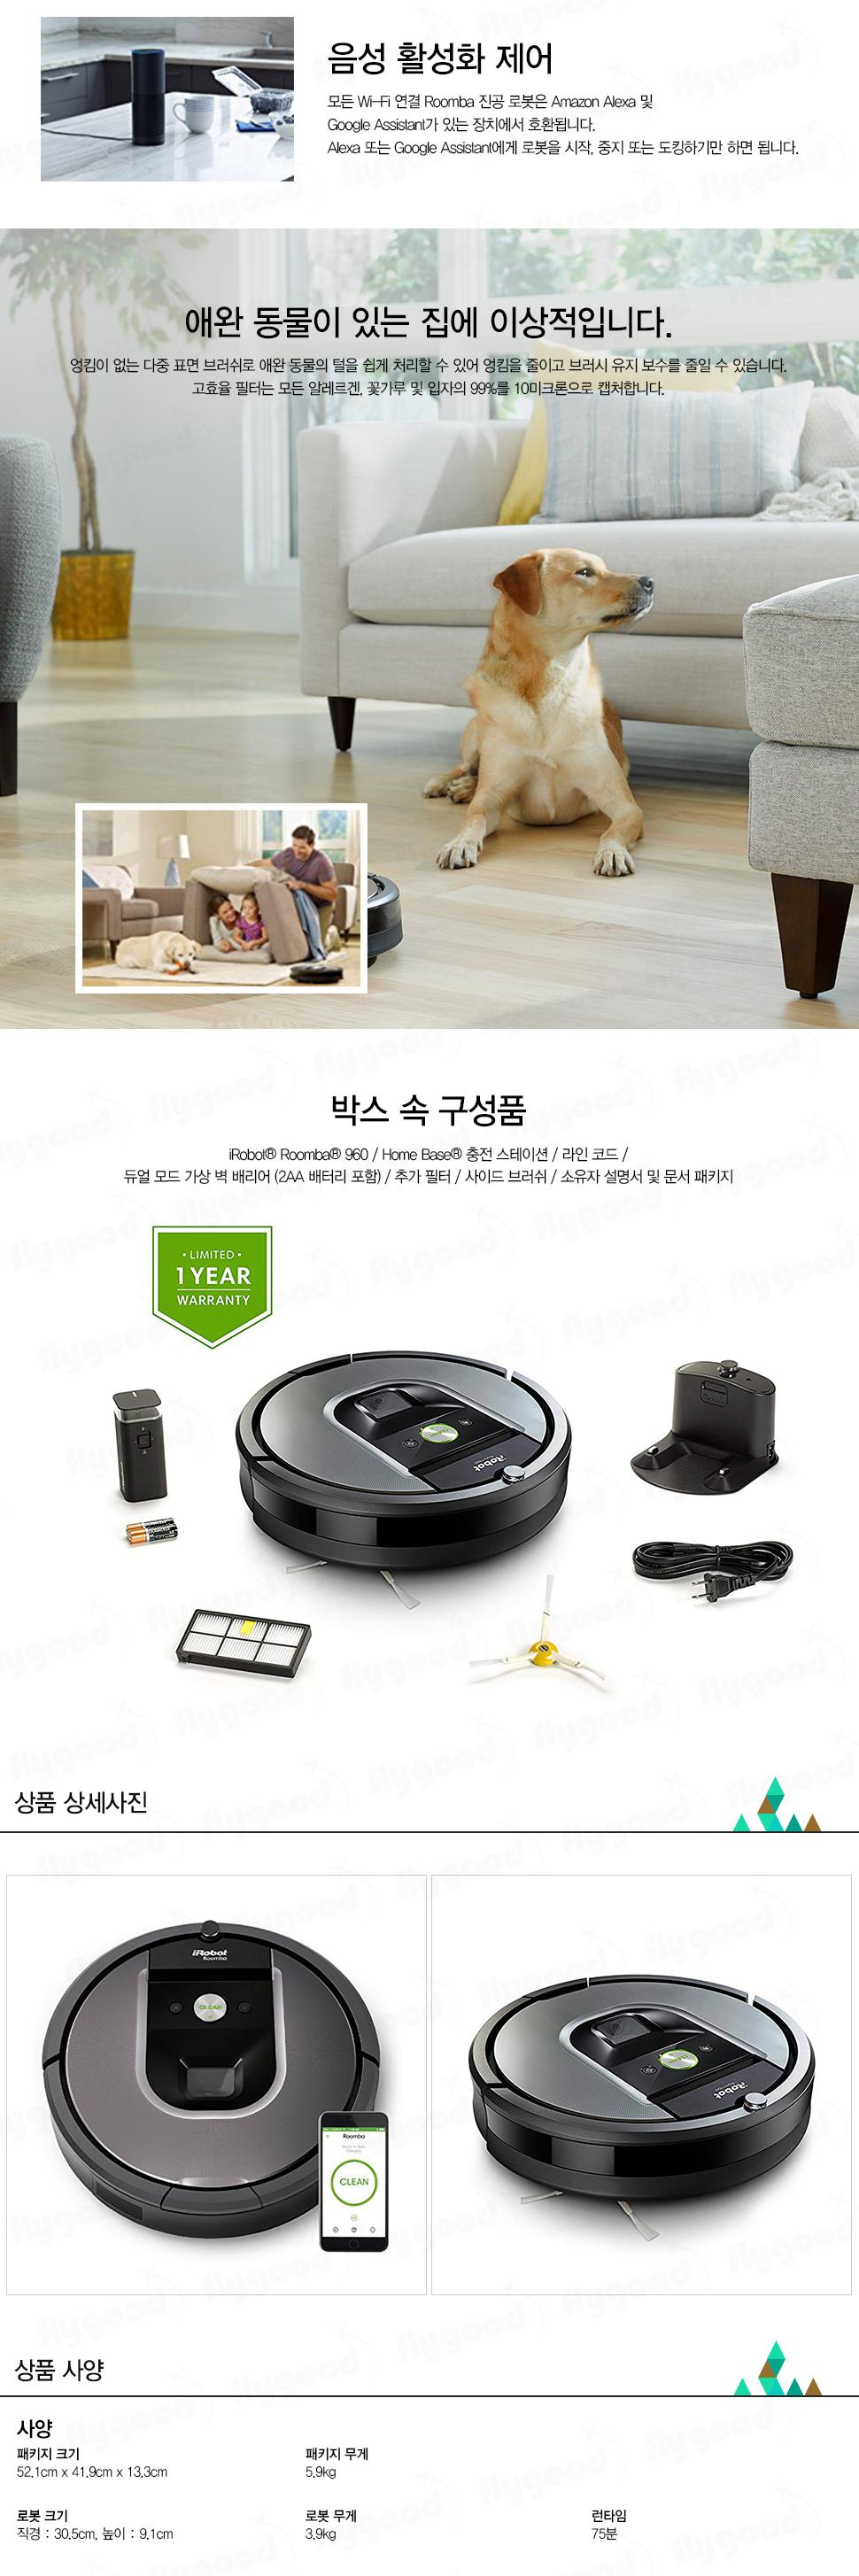 iRobot_Roomba_960_02.jpg